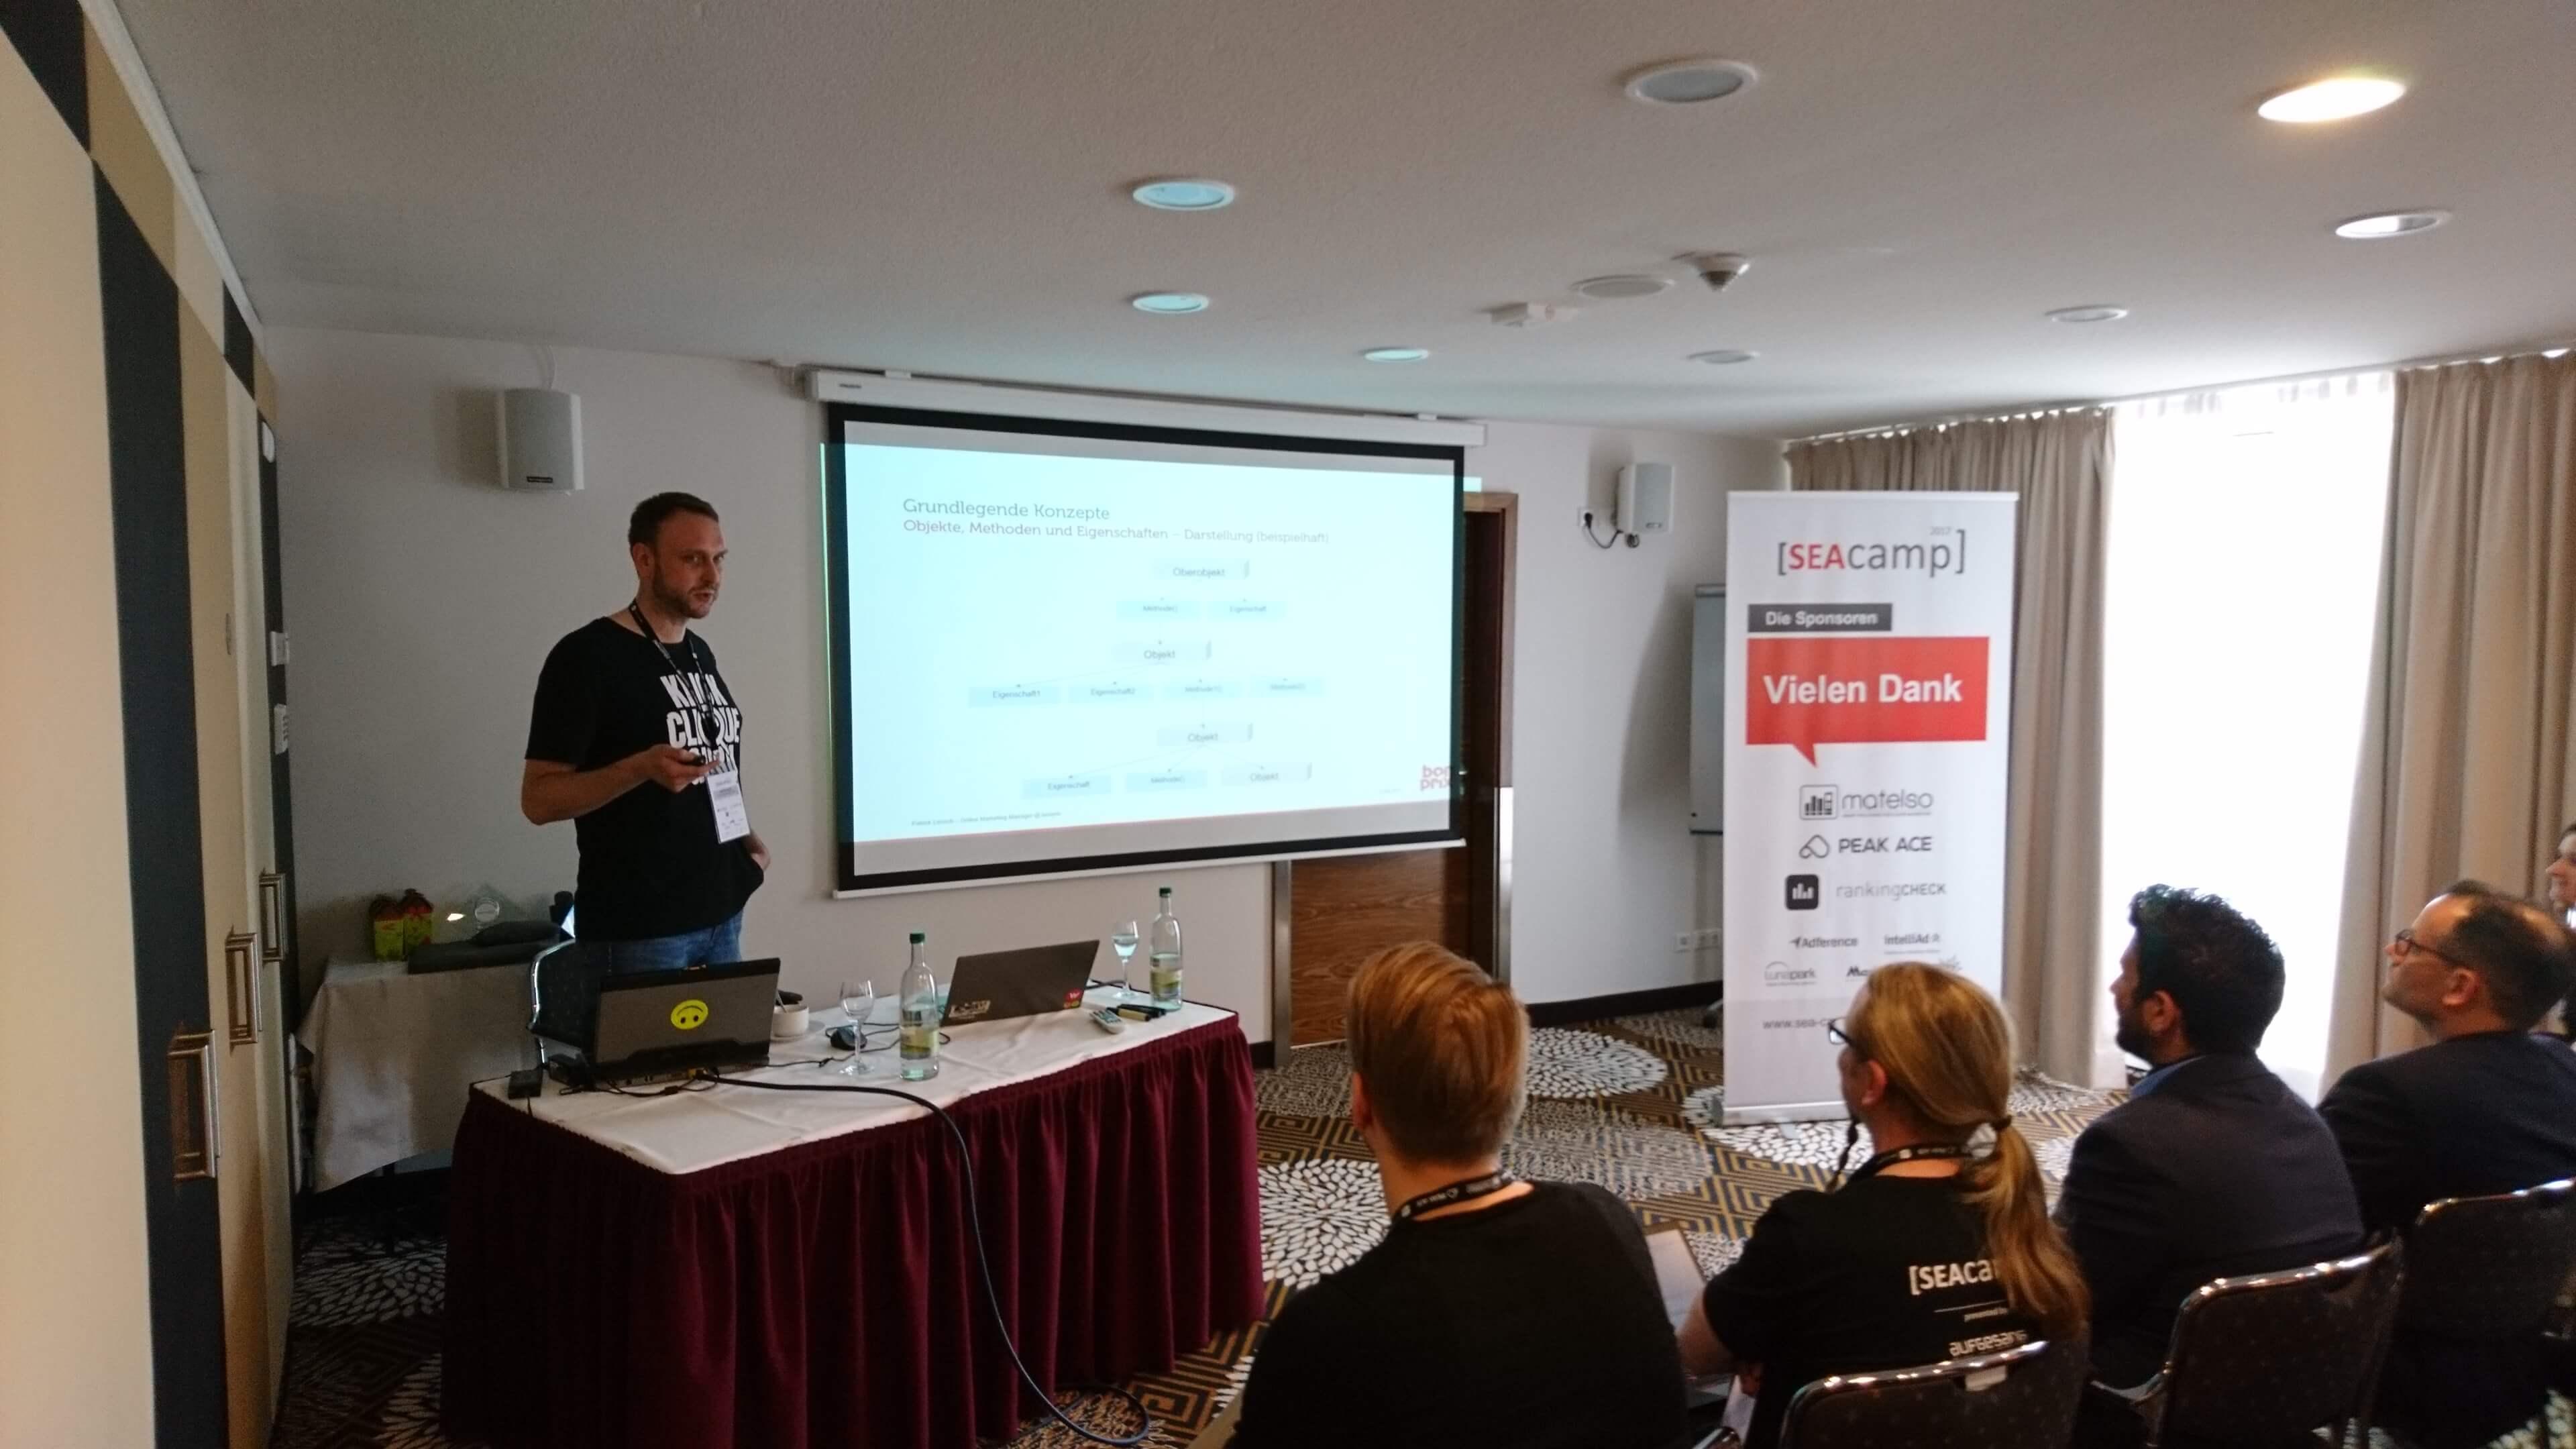 Patrick Lensch - SEAcamp 2017 Jena